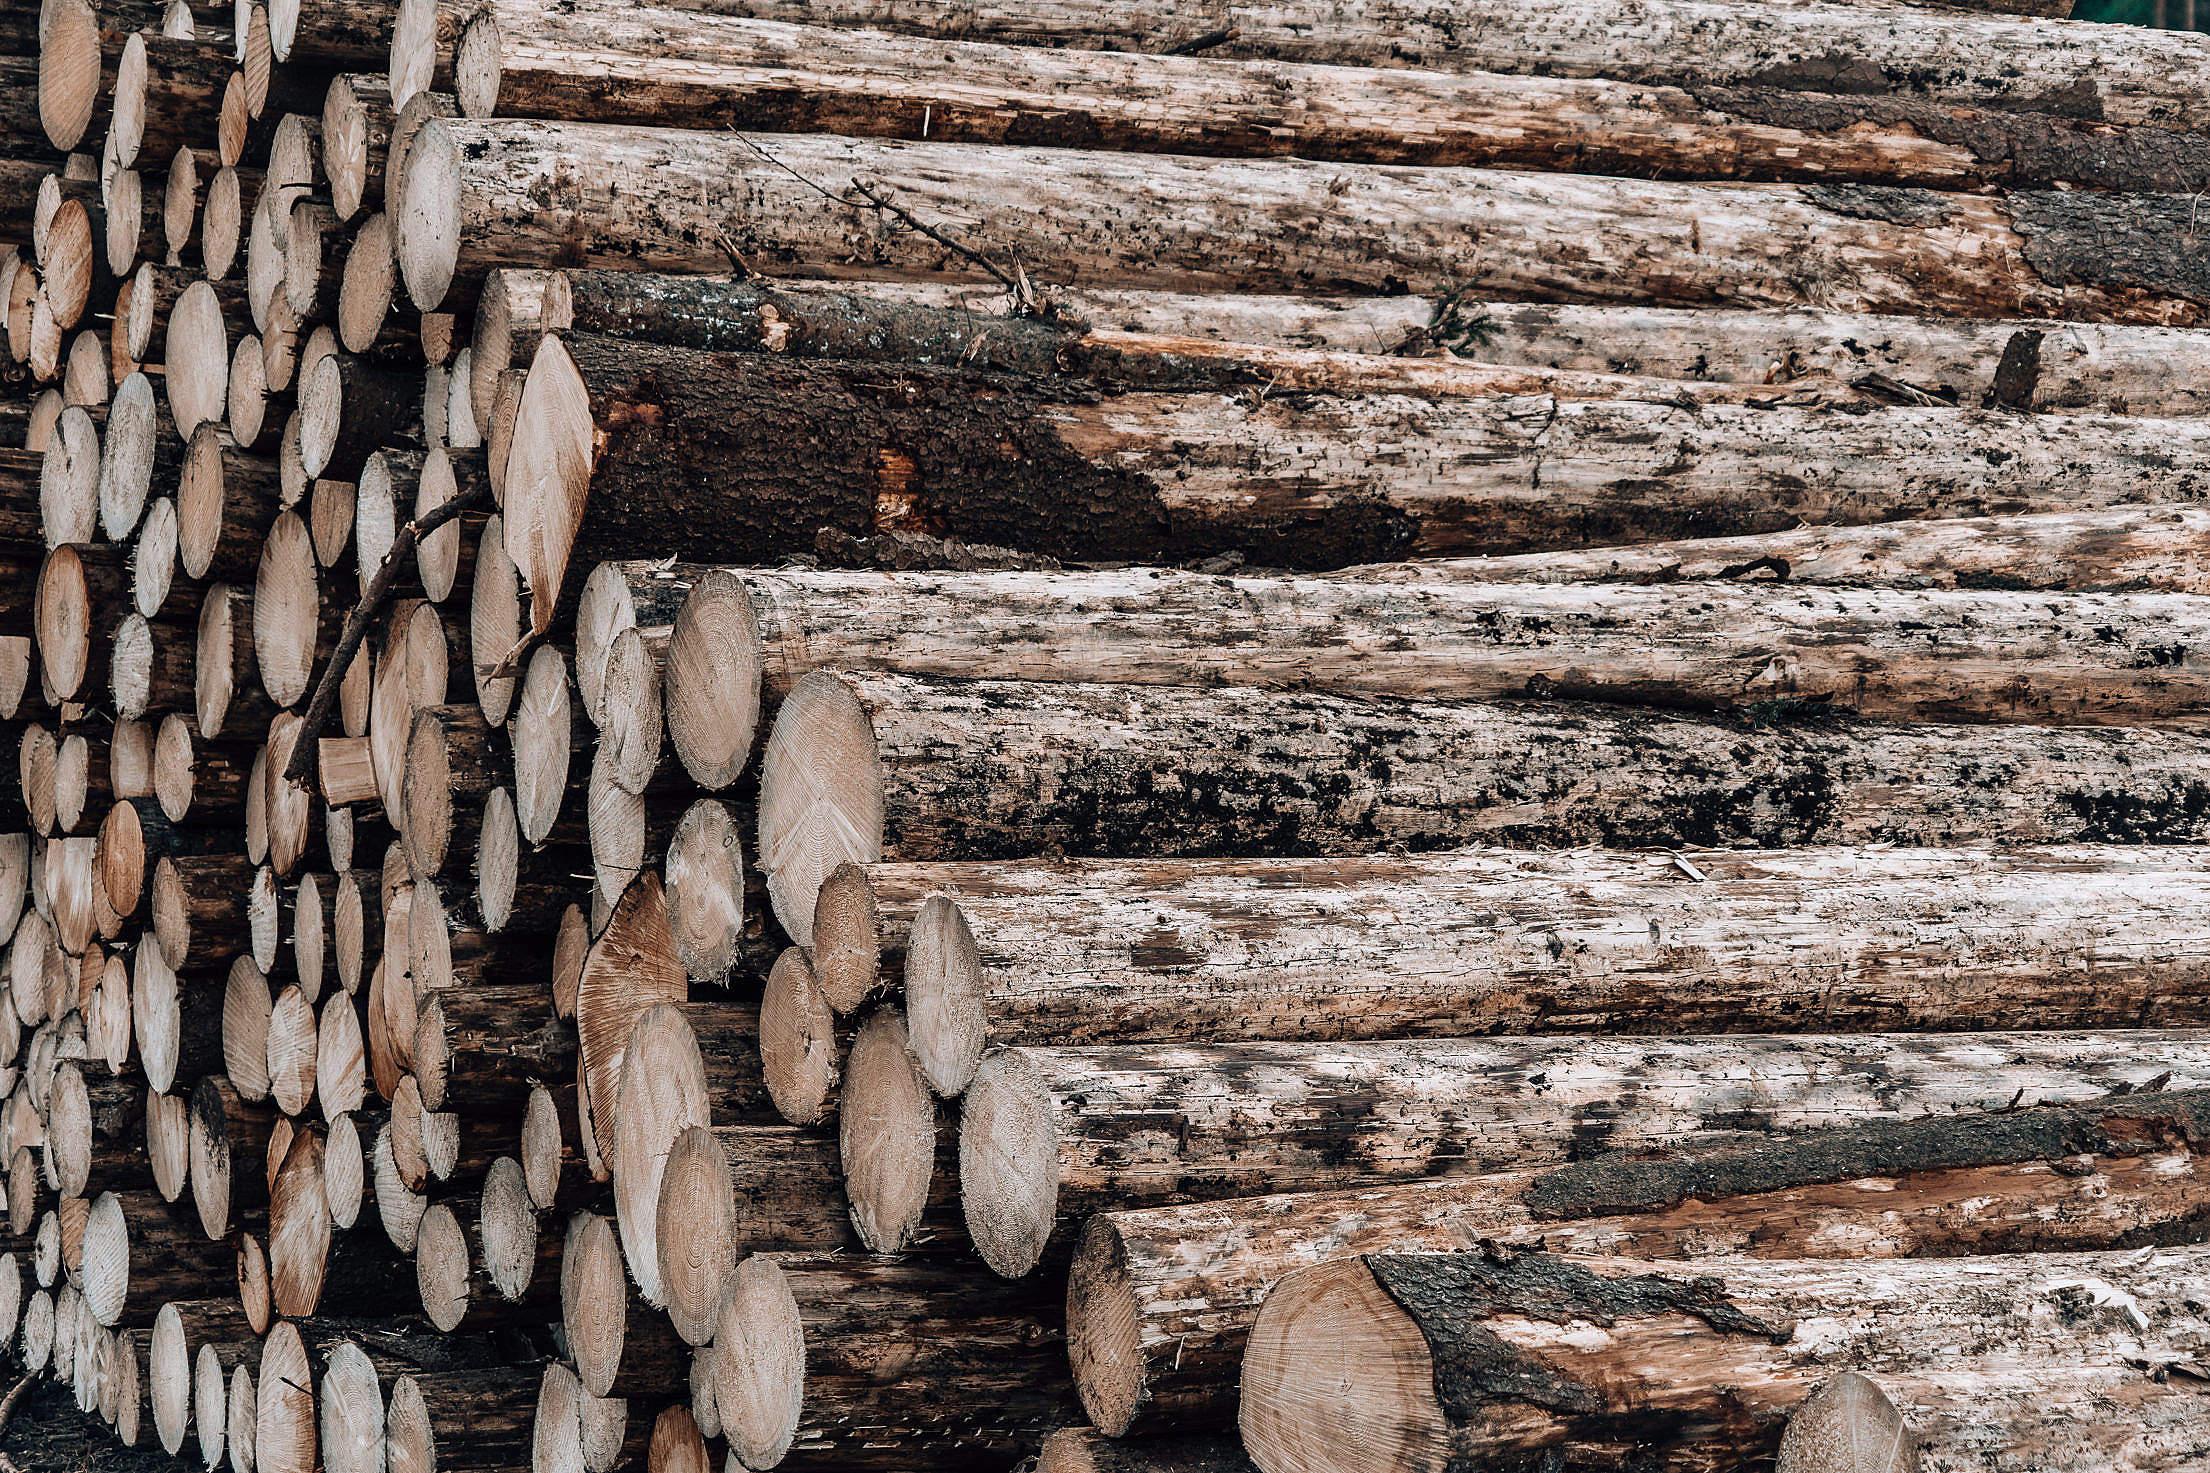 Wood Logs Free Stock Photo